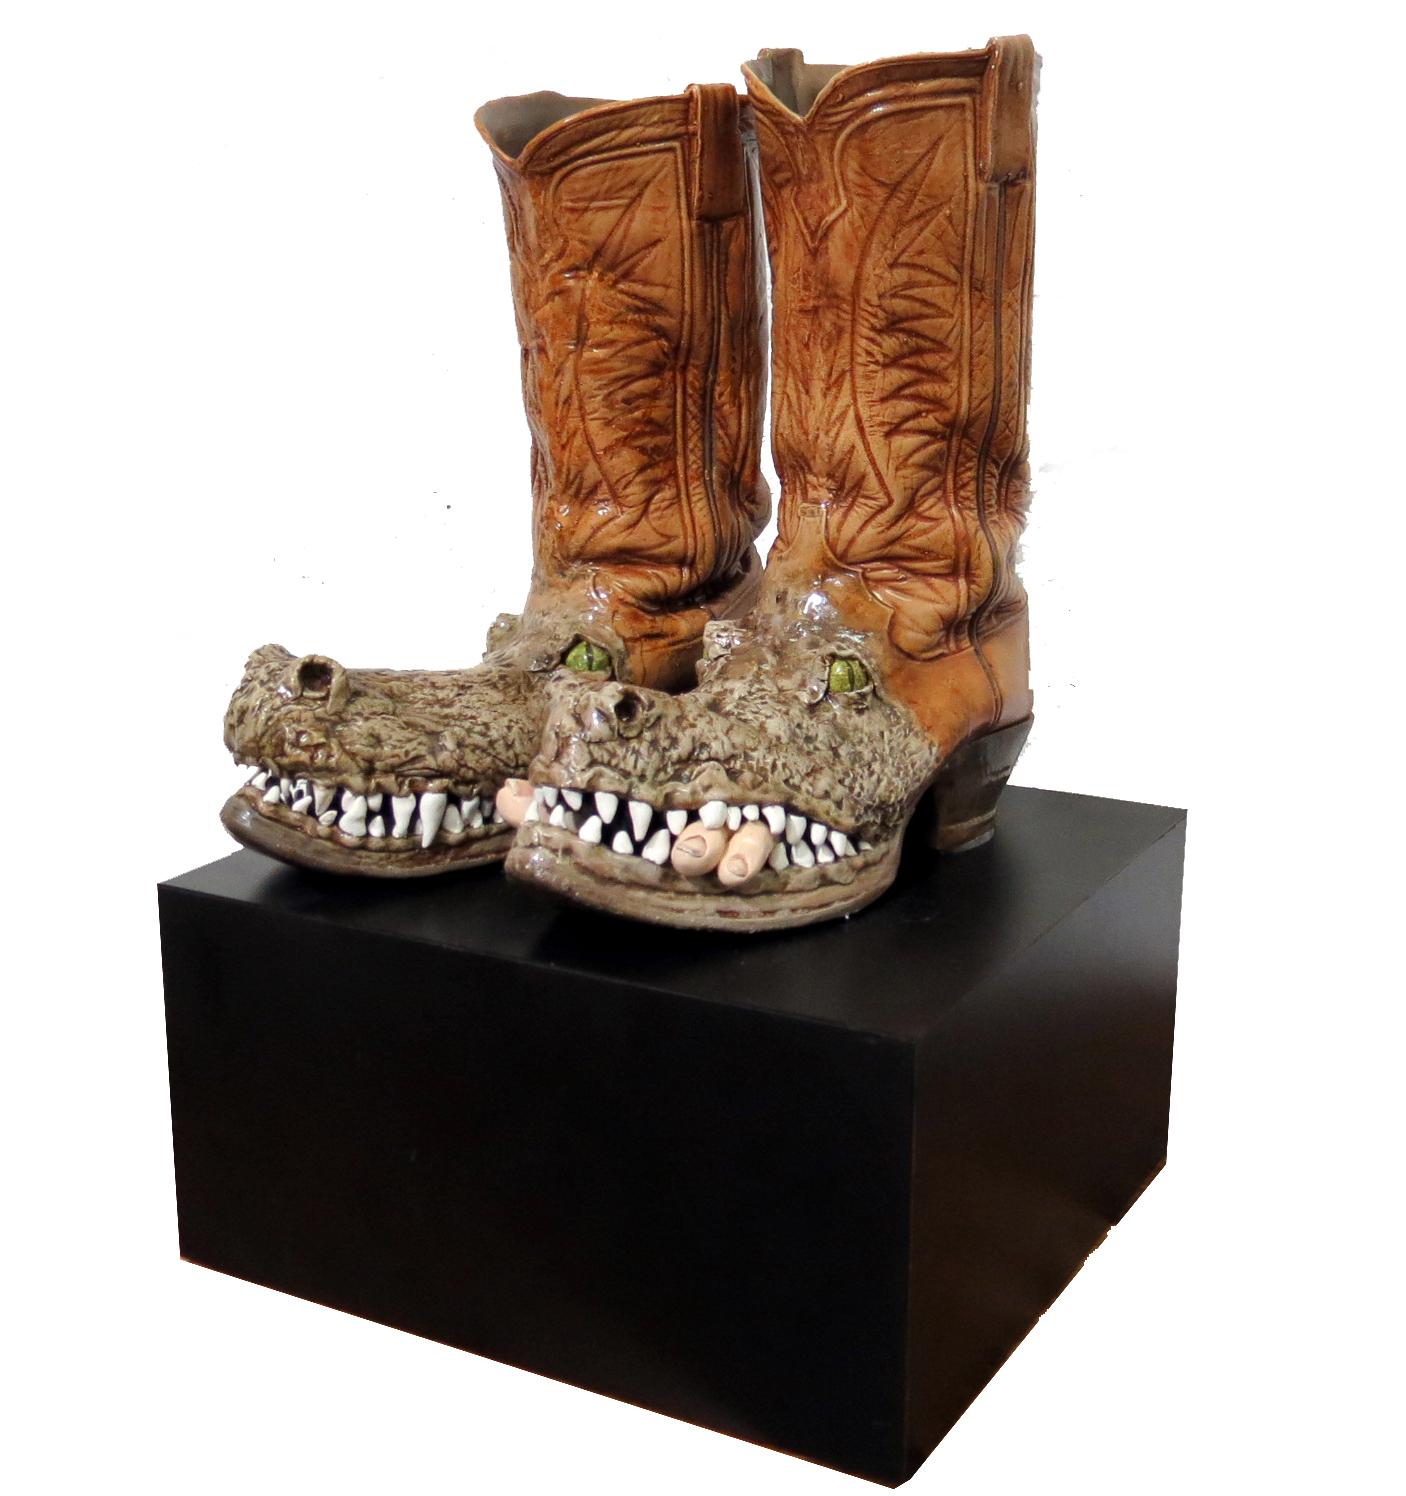 Genuine Alligator Boots Sculpture By Bob Howell  Modernism